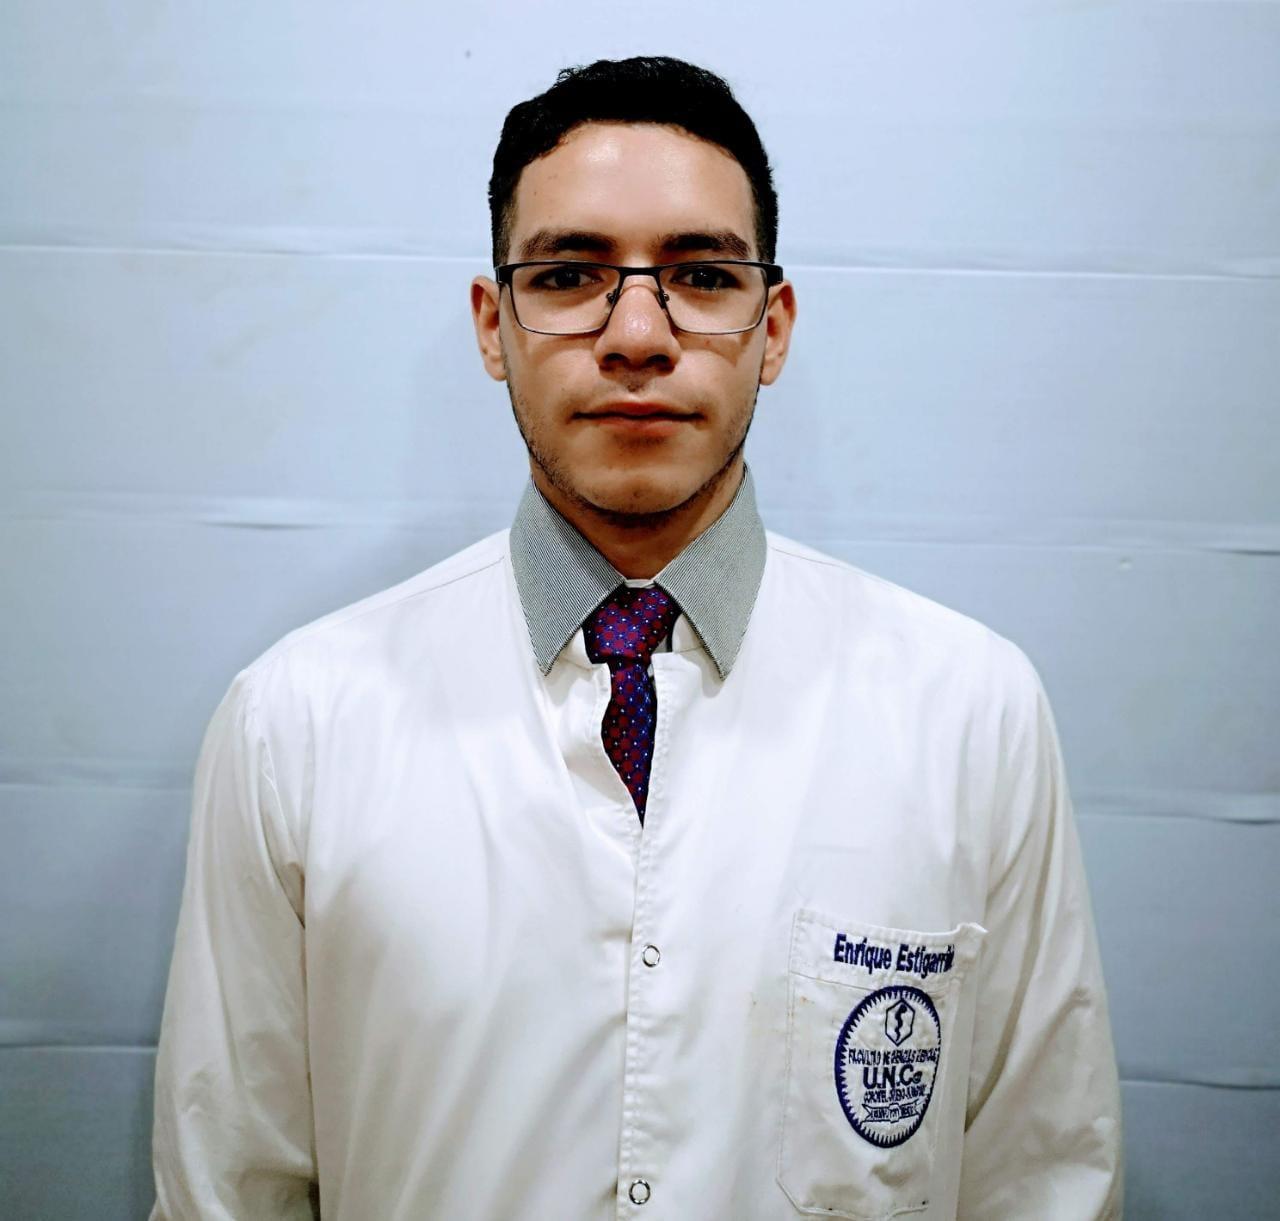 Univ. Enrique Daniel Estigarribia Gómez